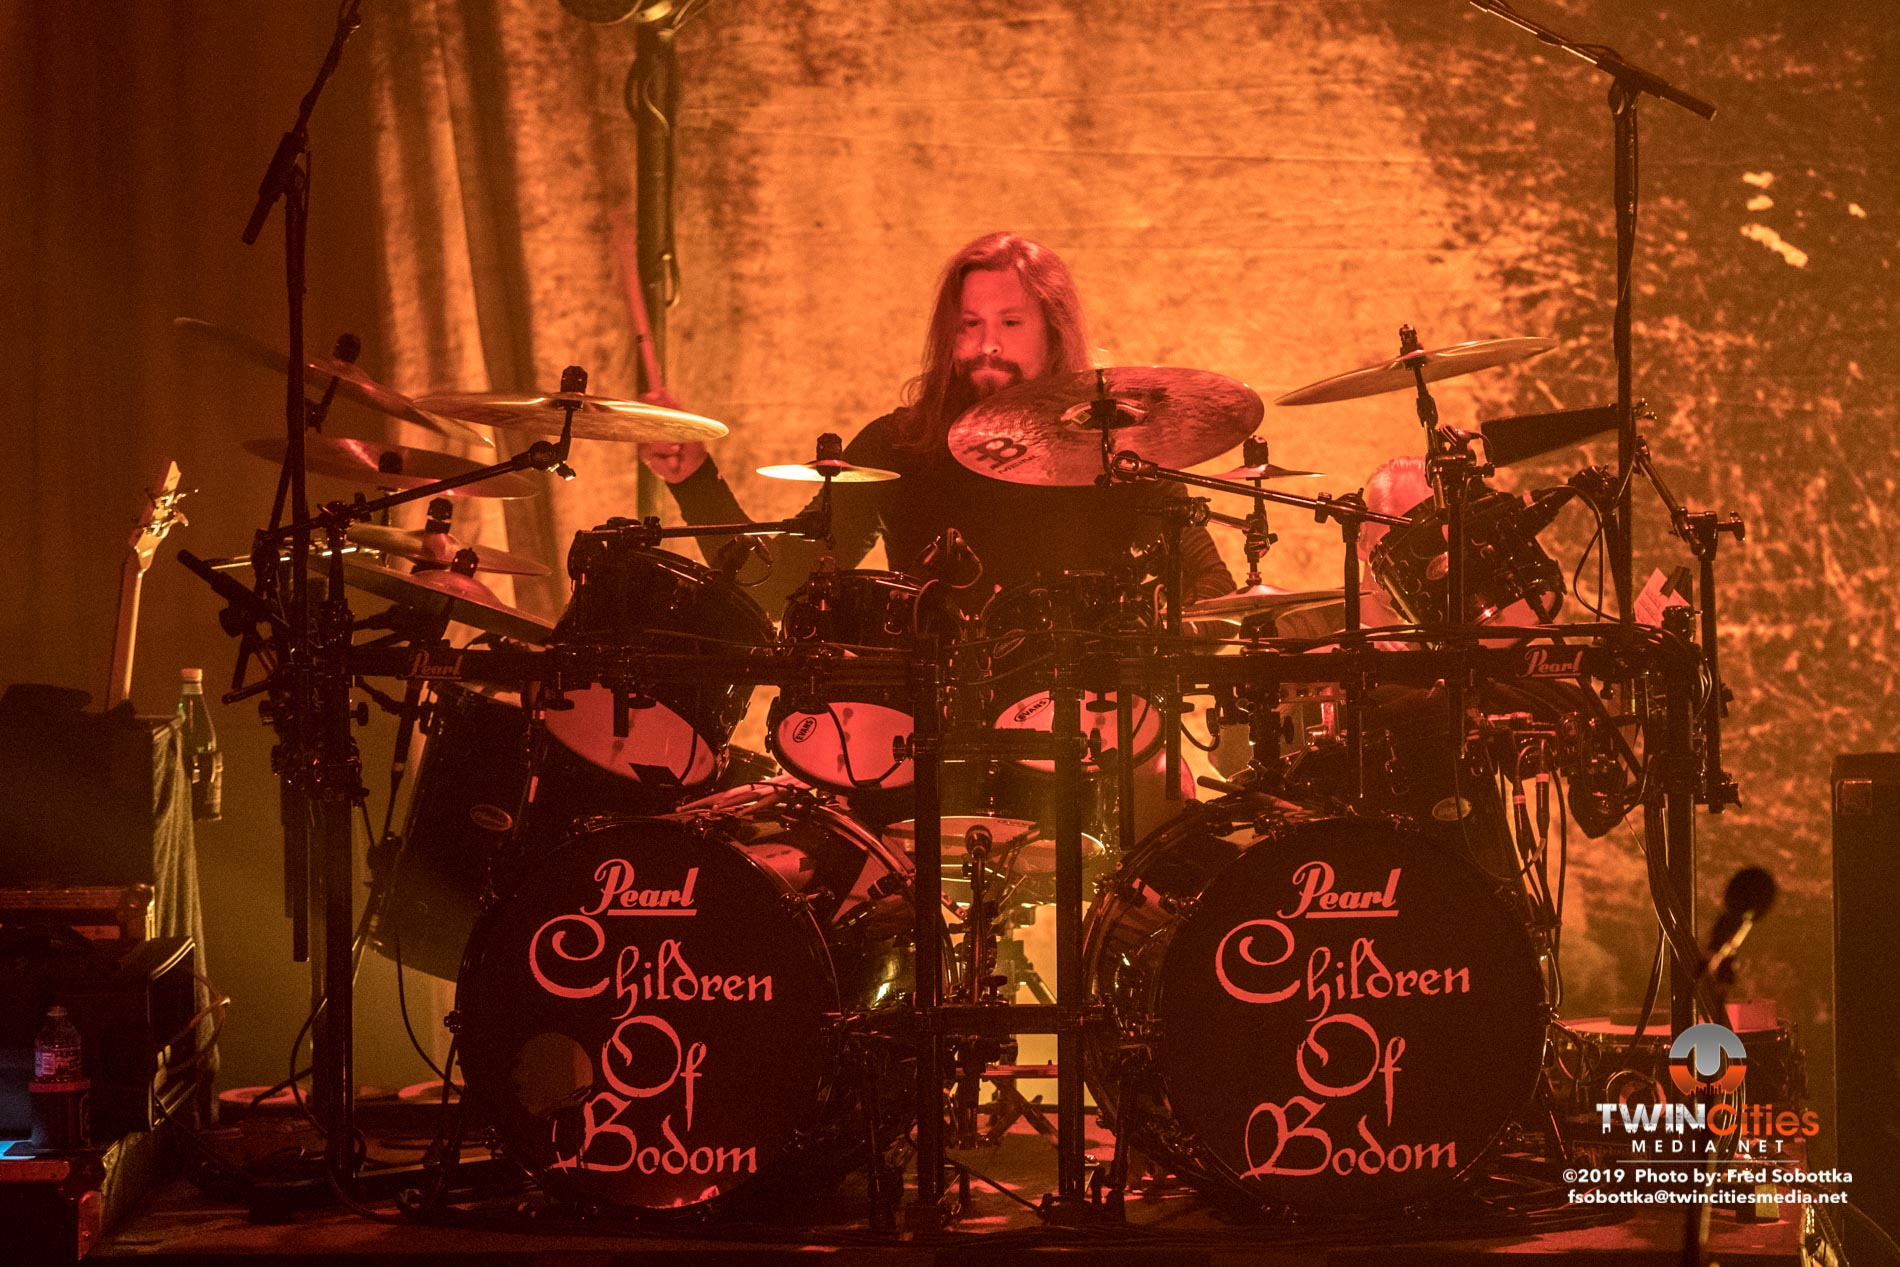 Children-of-Bodom-13